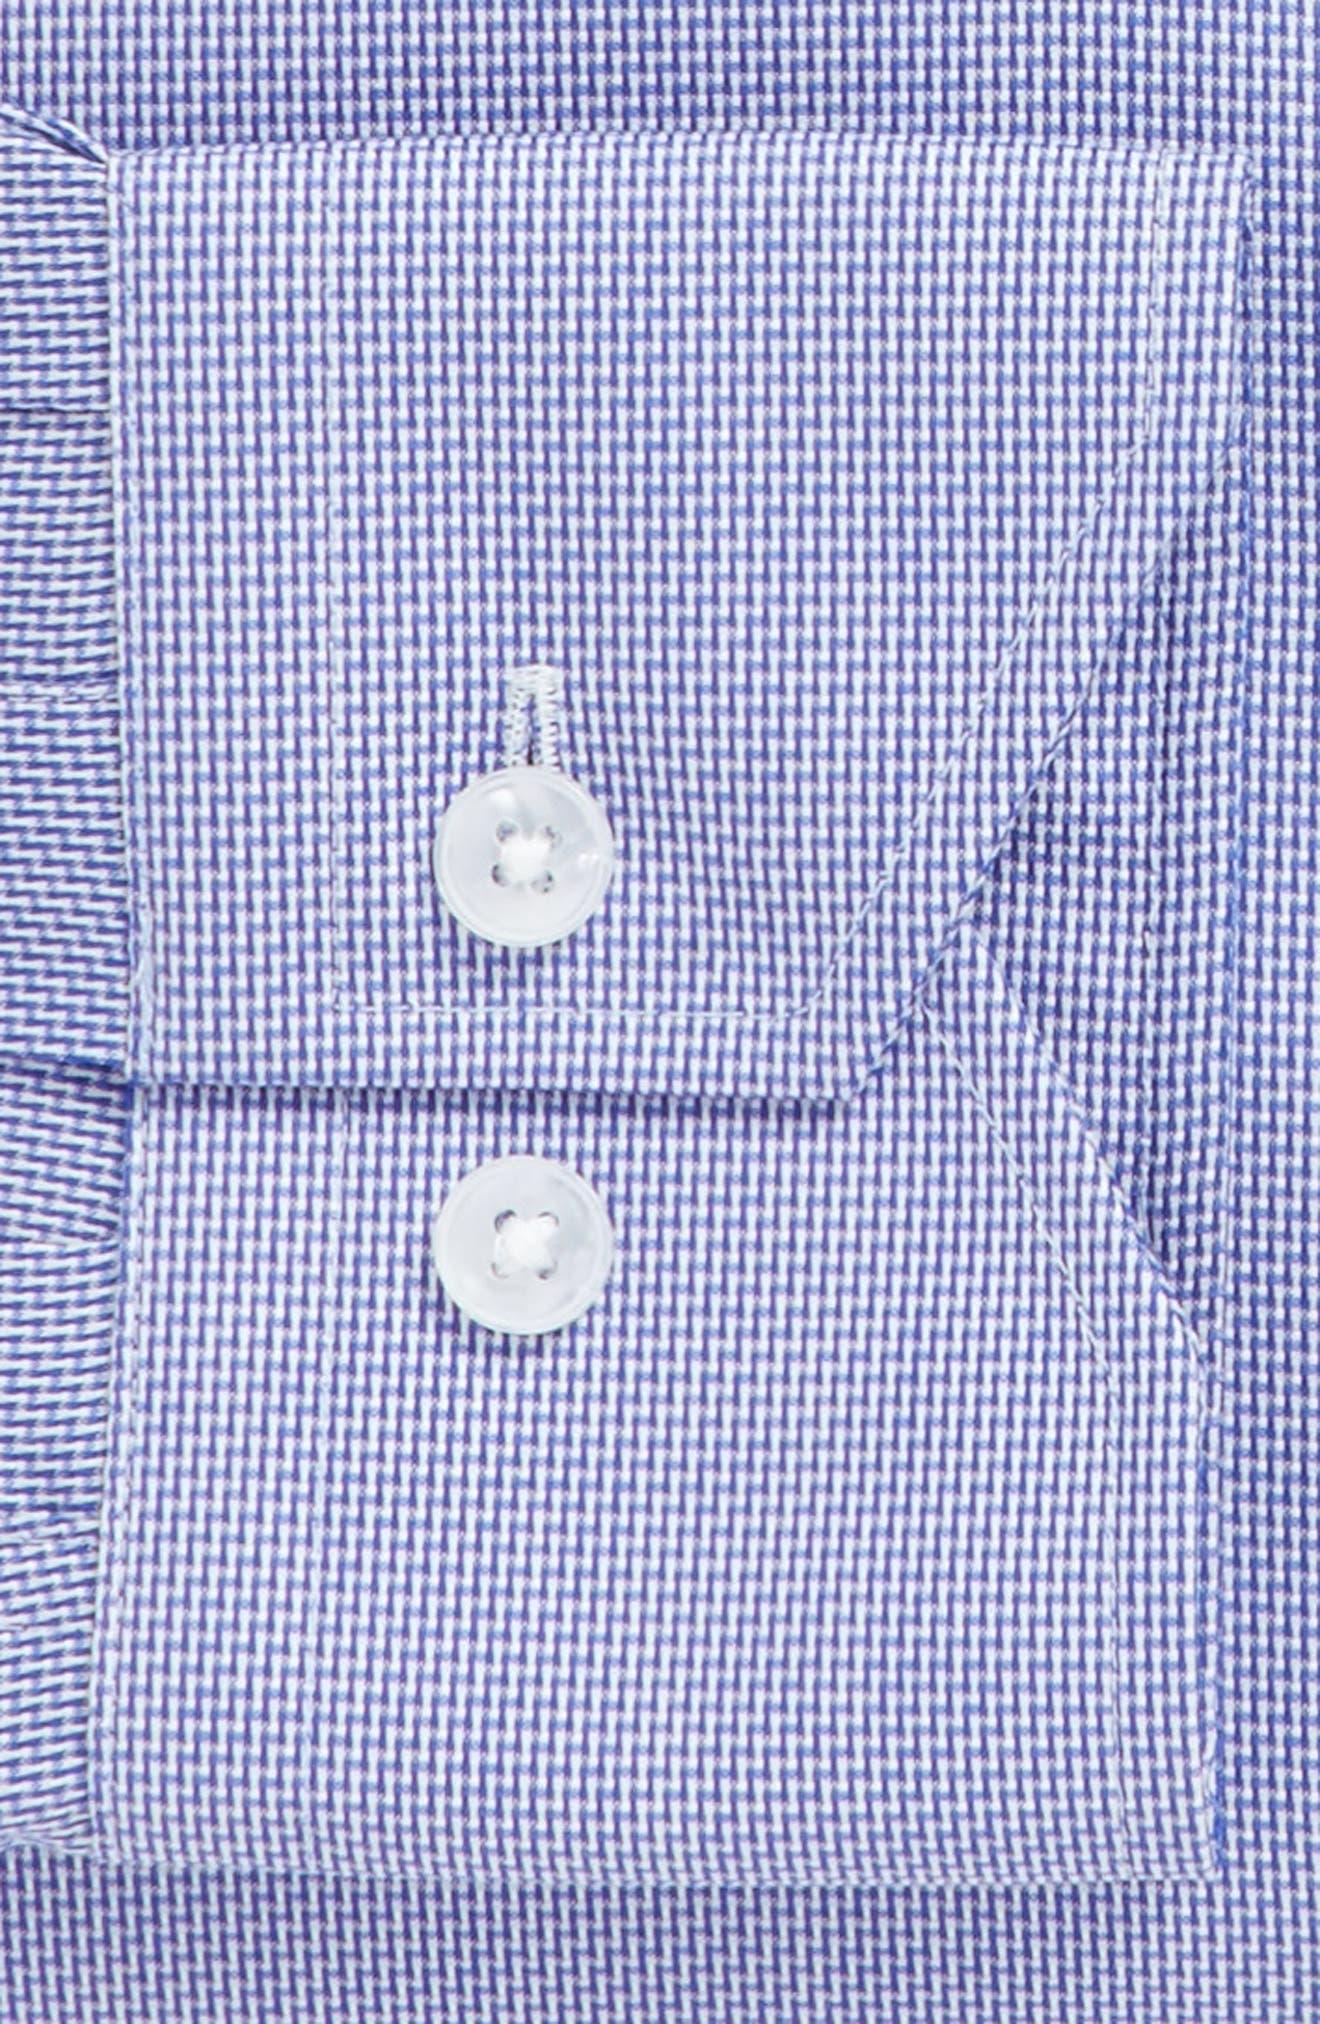 Trim Fit Solid Dress Shirt,                             Alternate thumbnail 3, color,                             Navy